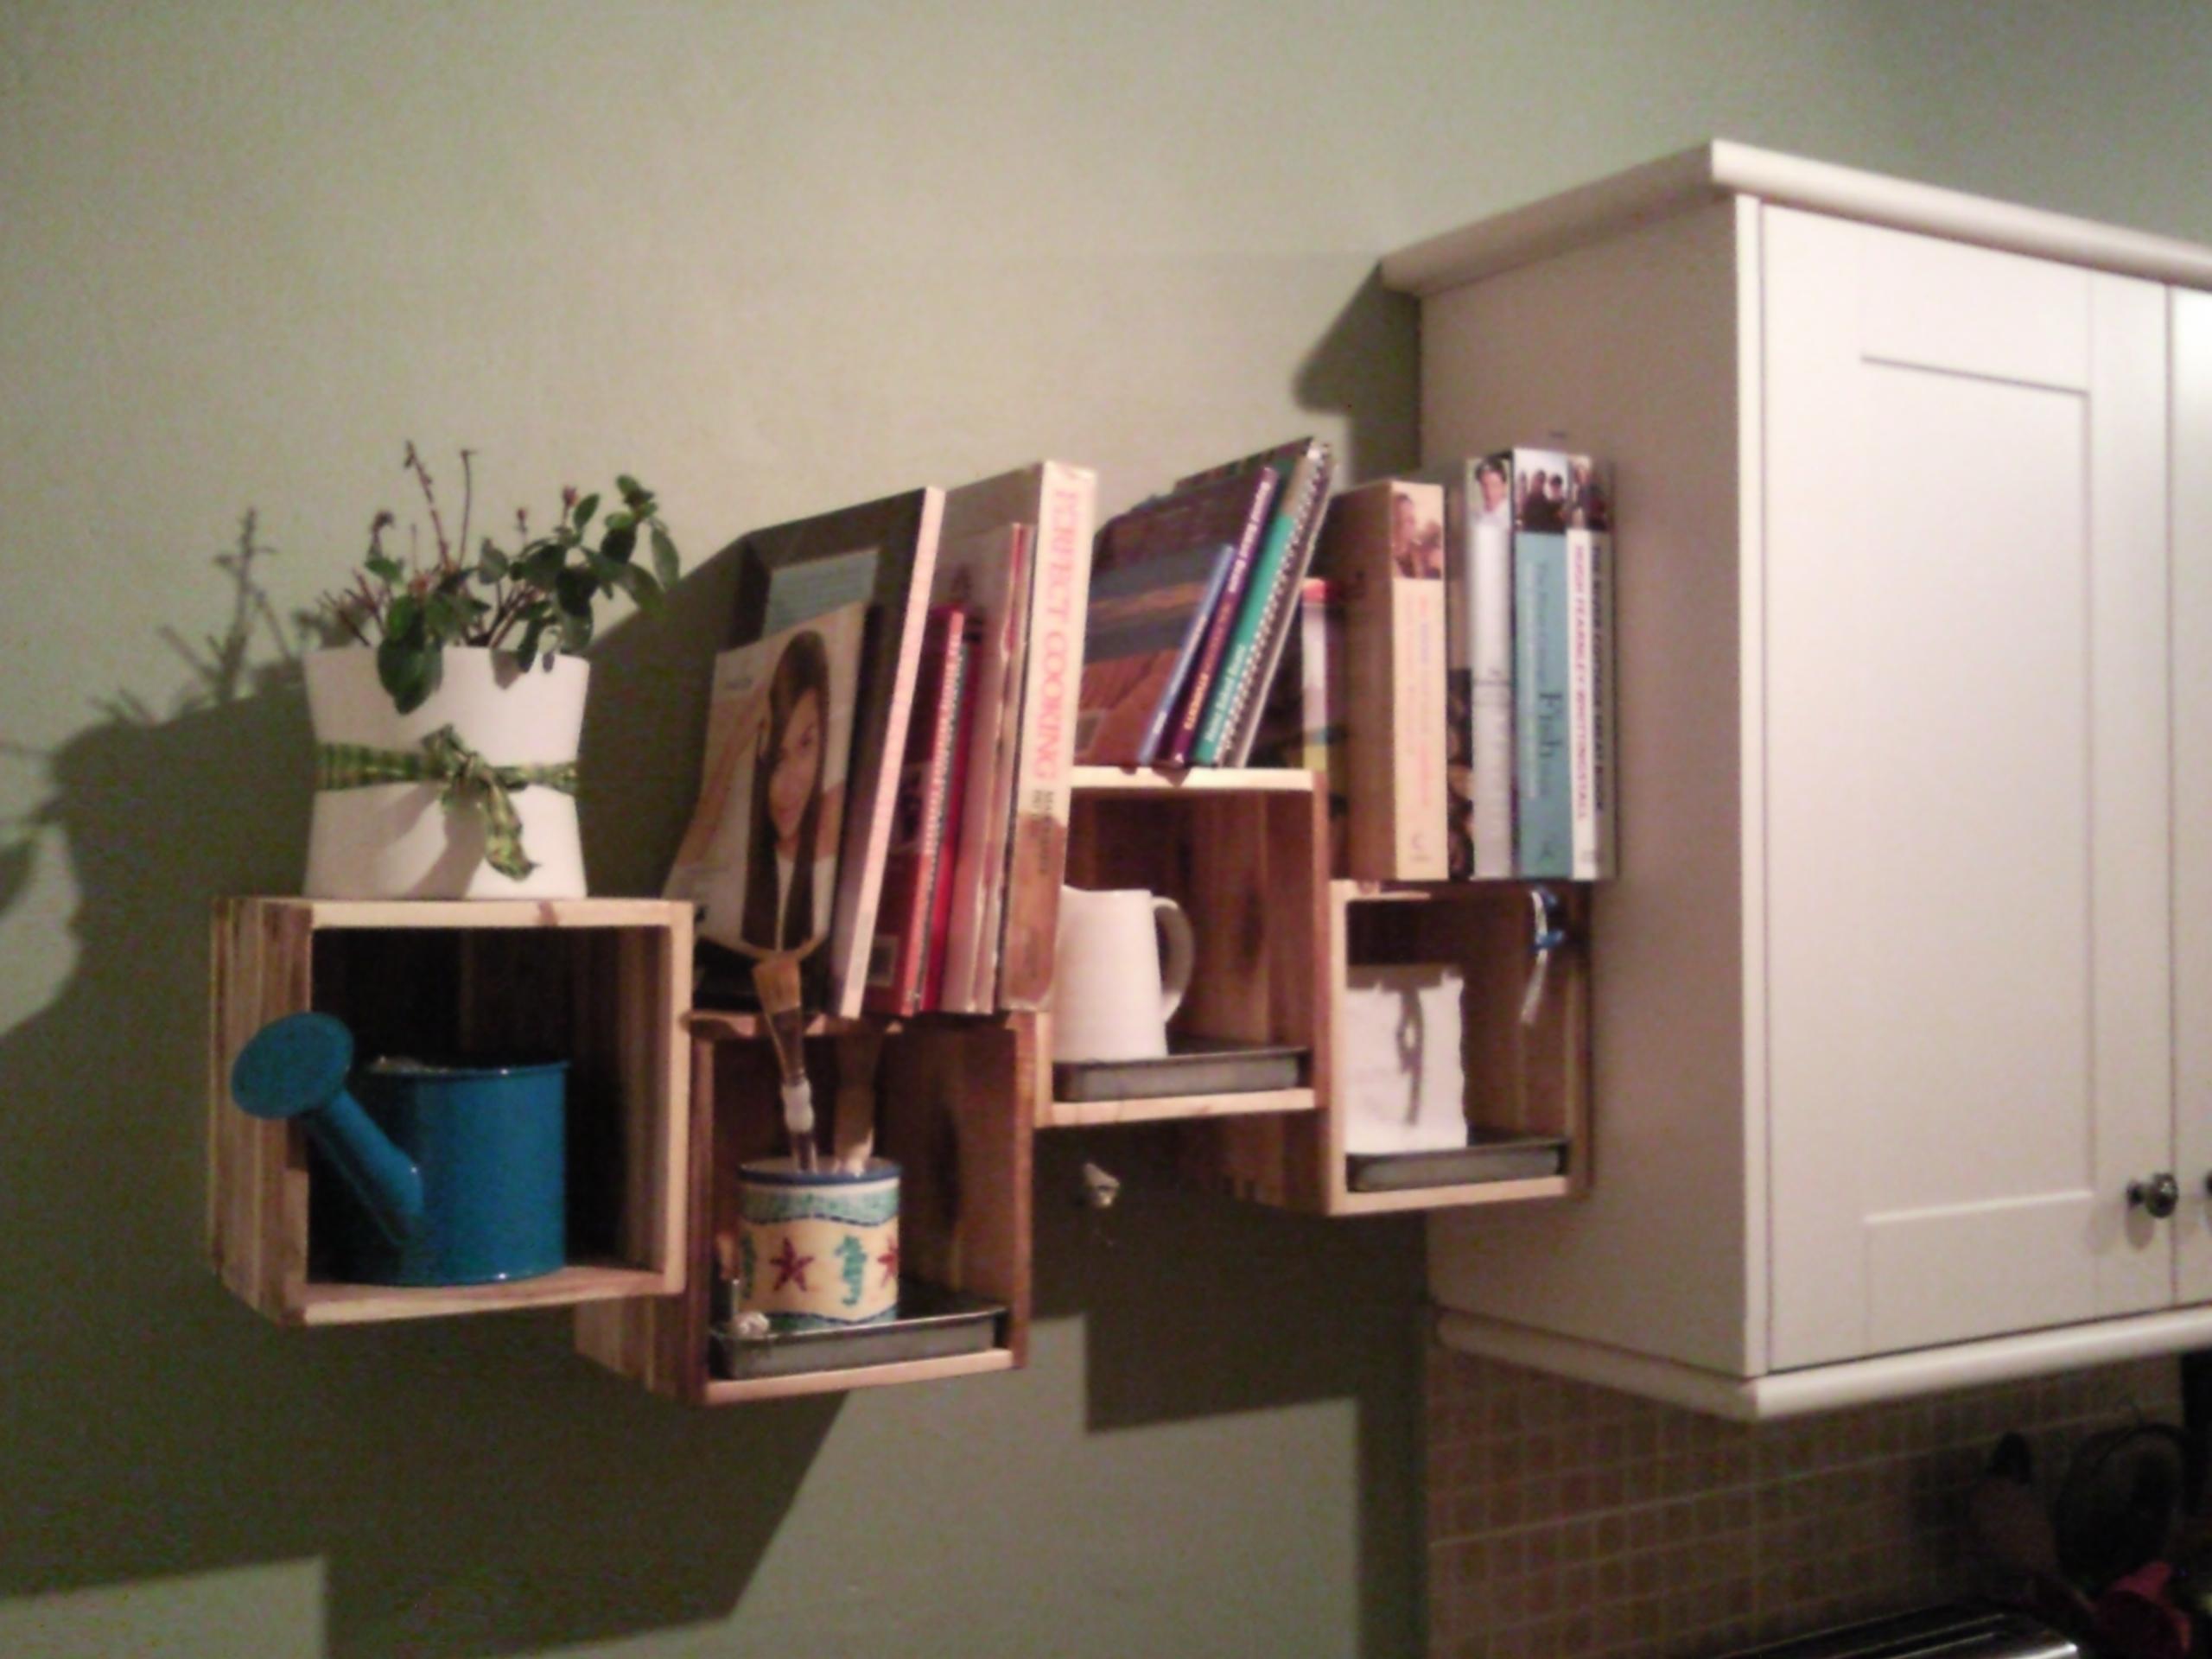 IKEA Hack - Planting Shelves